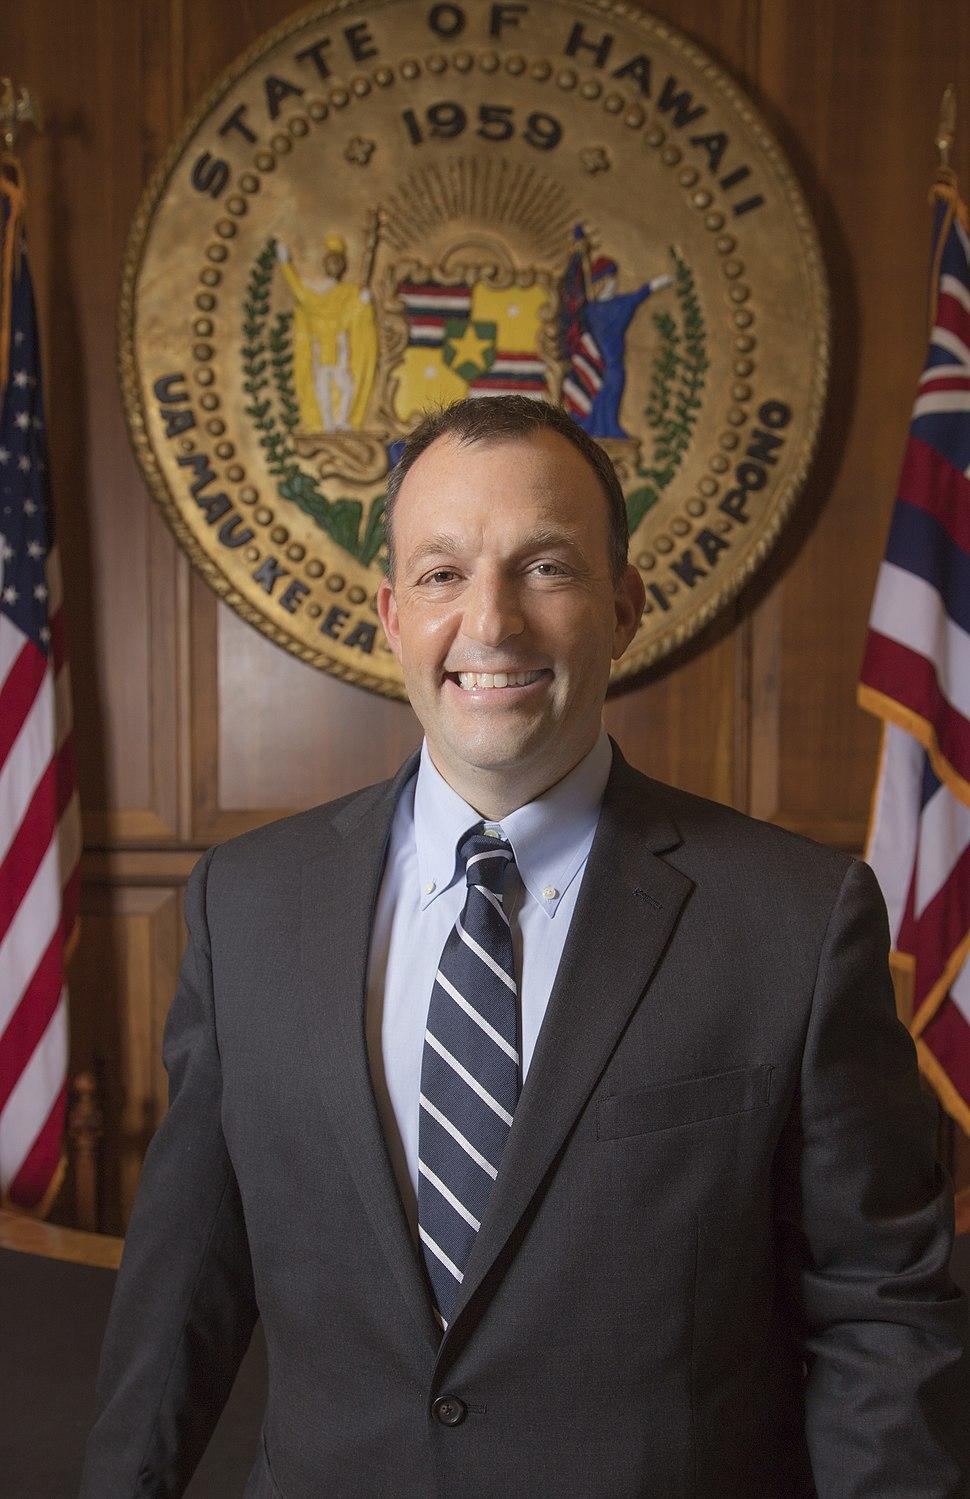 Lieutenant Governor of Hawaii Josh Green